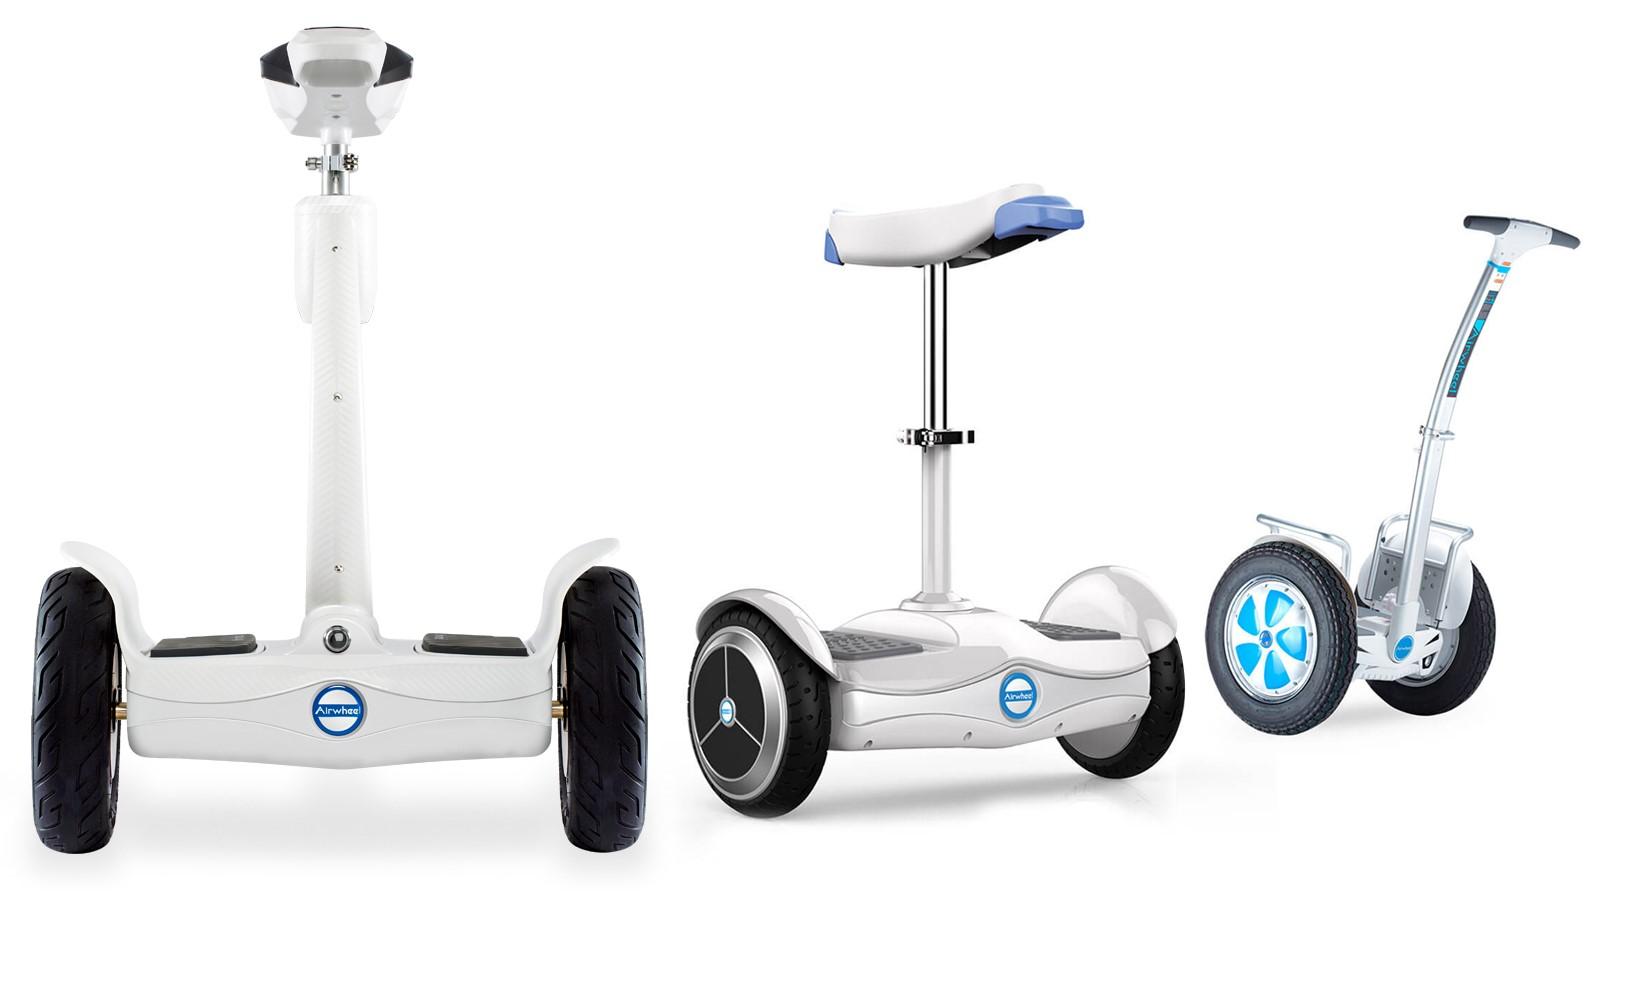 Airwheel-S8-mini-electric-self-balance-scooter